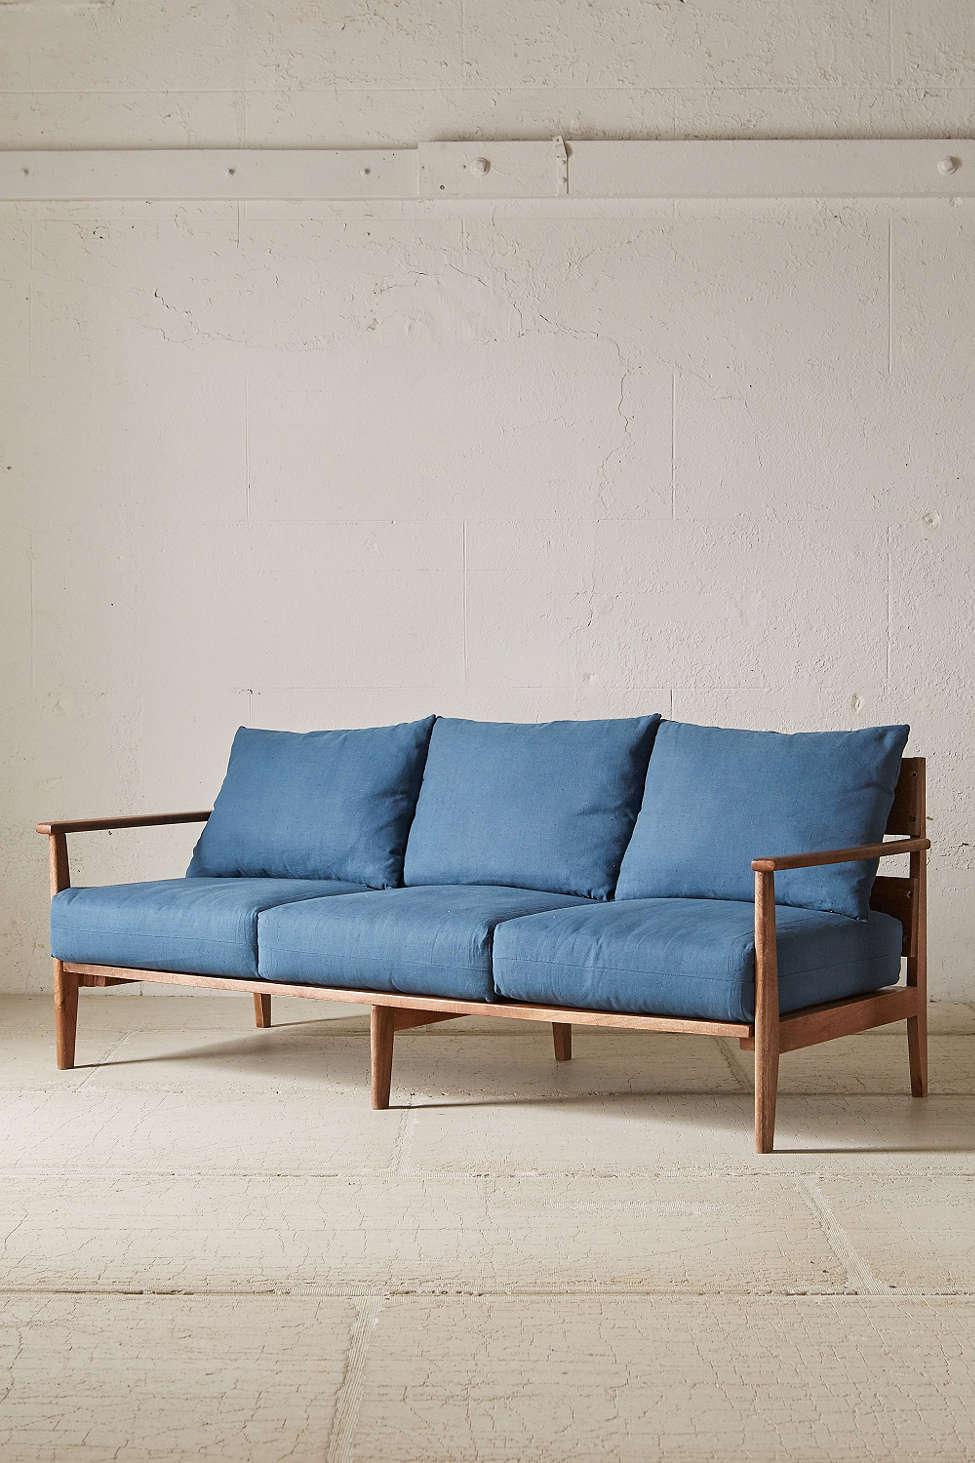 paxton-sofa-urban-outfitters.jpg